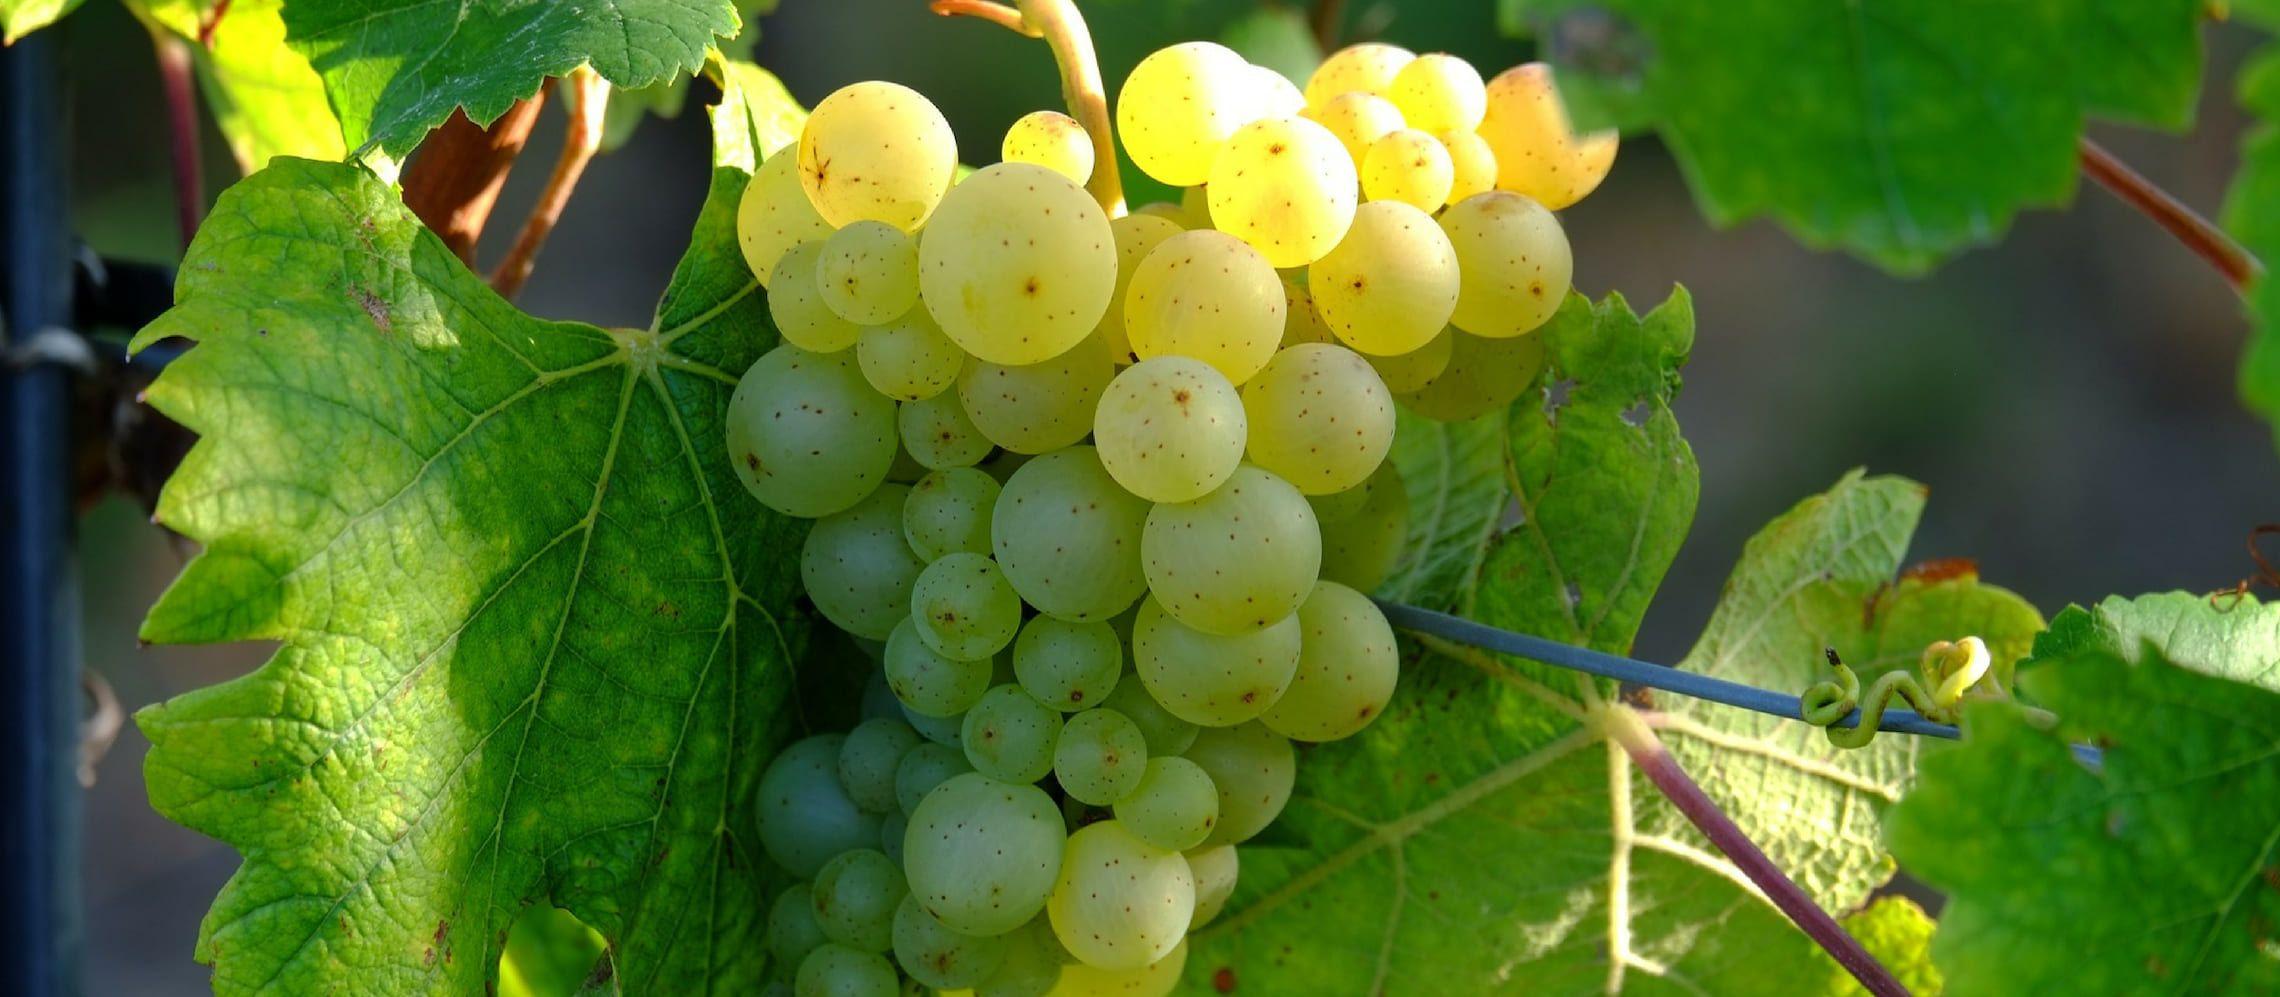 Photo for: Italian Grape Varieties – White Wine